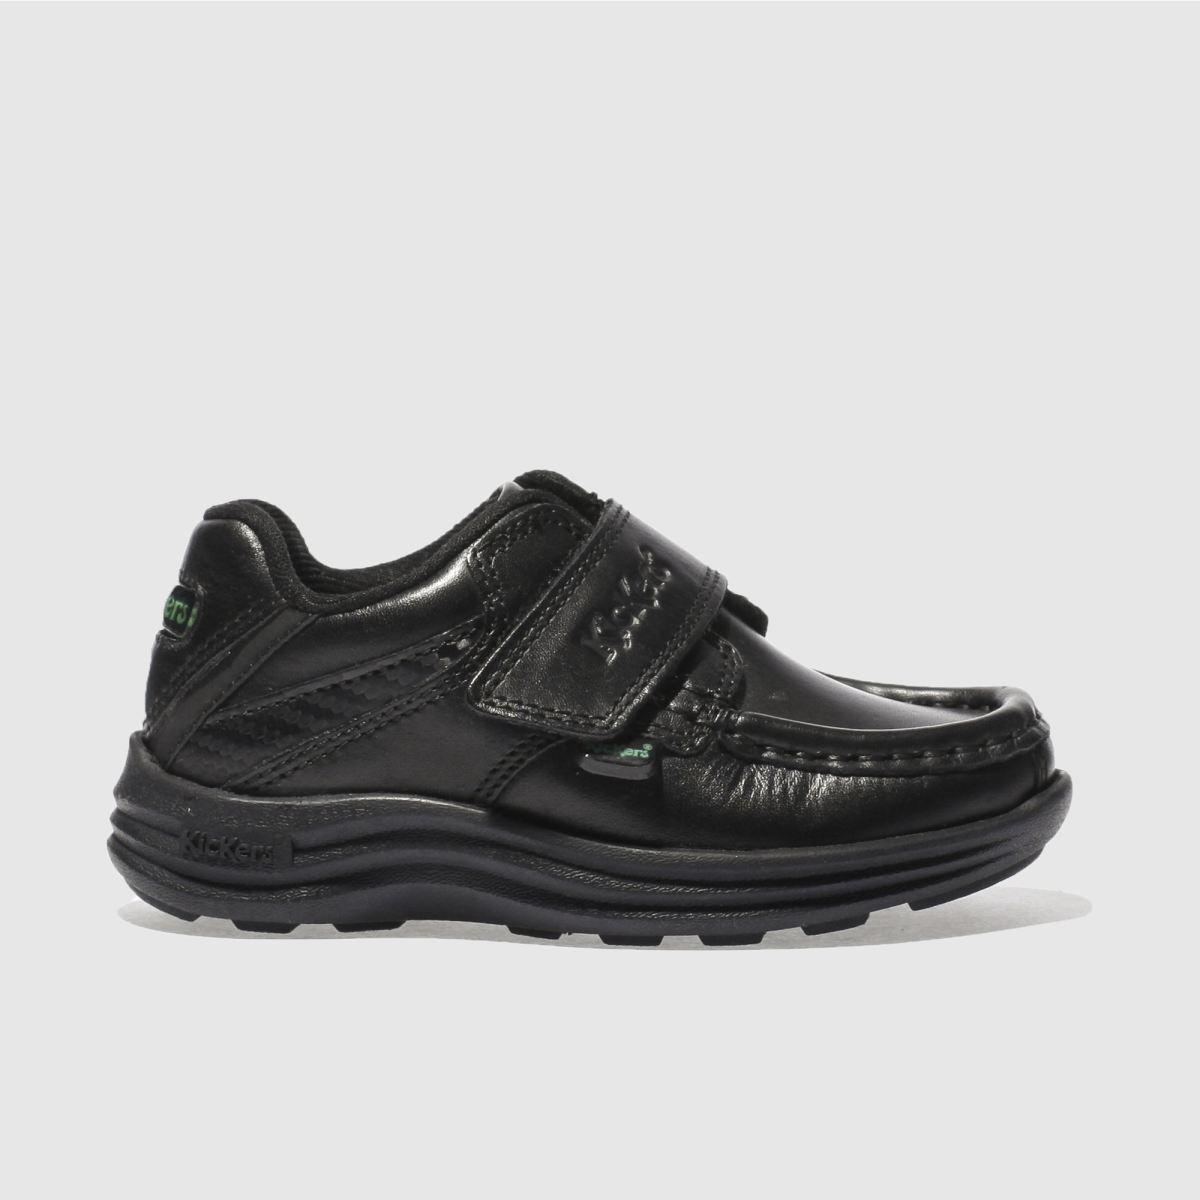 Kickers Black Reasan Strap Shoes Toddler